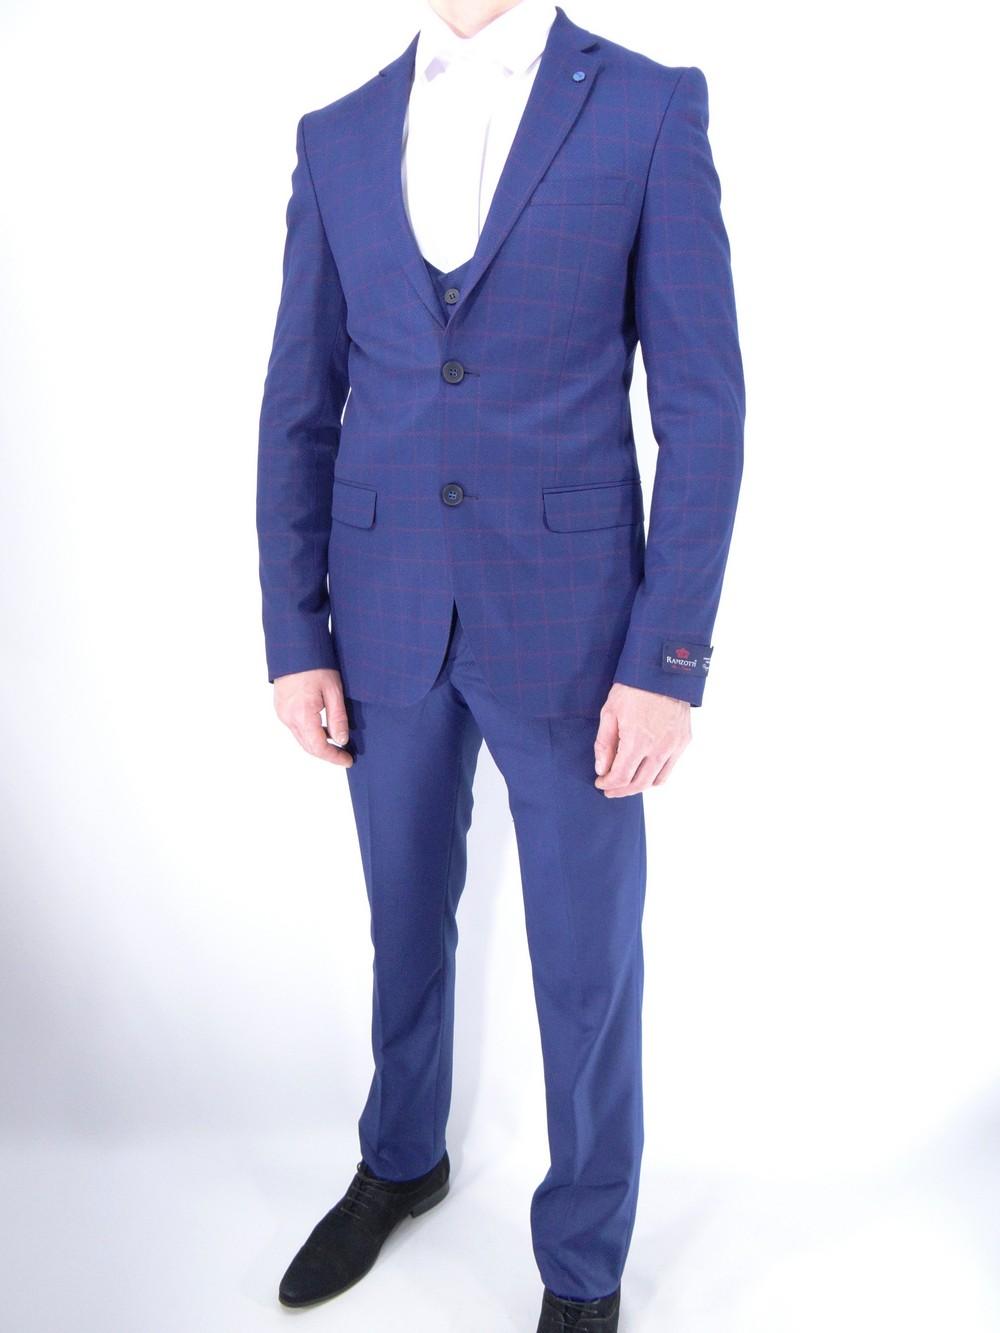 Классический костюм Ramzotti